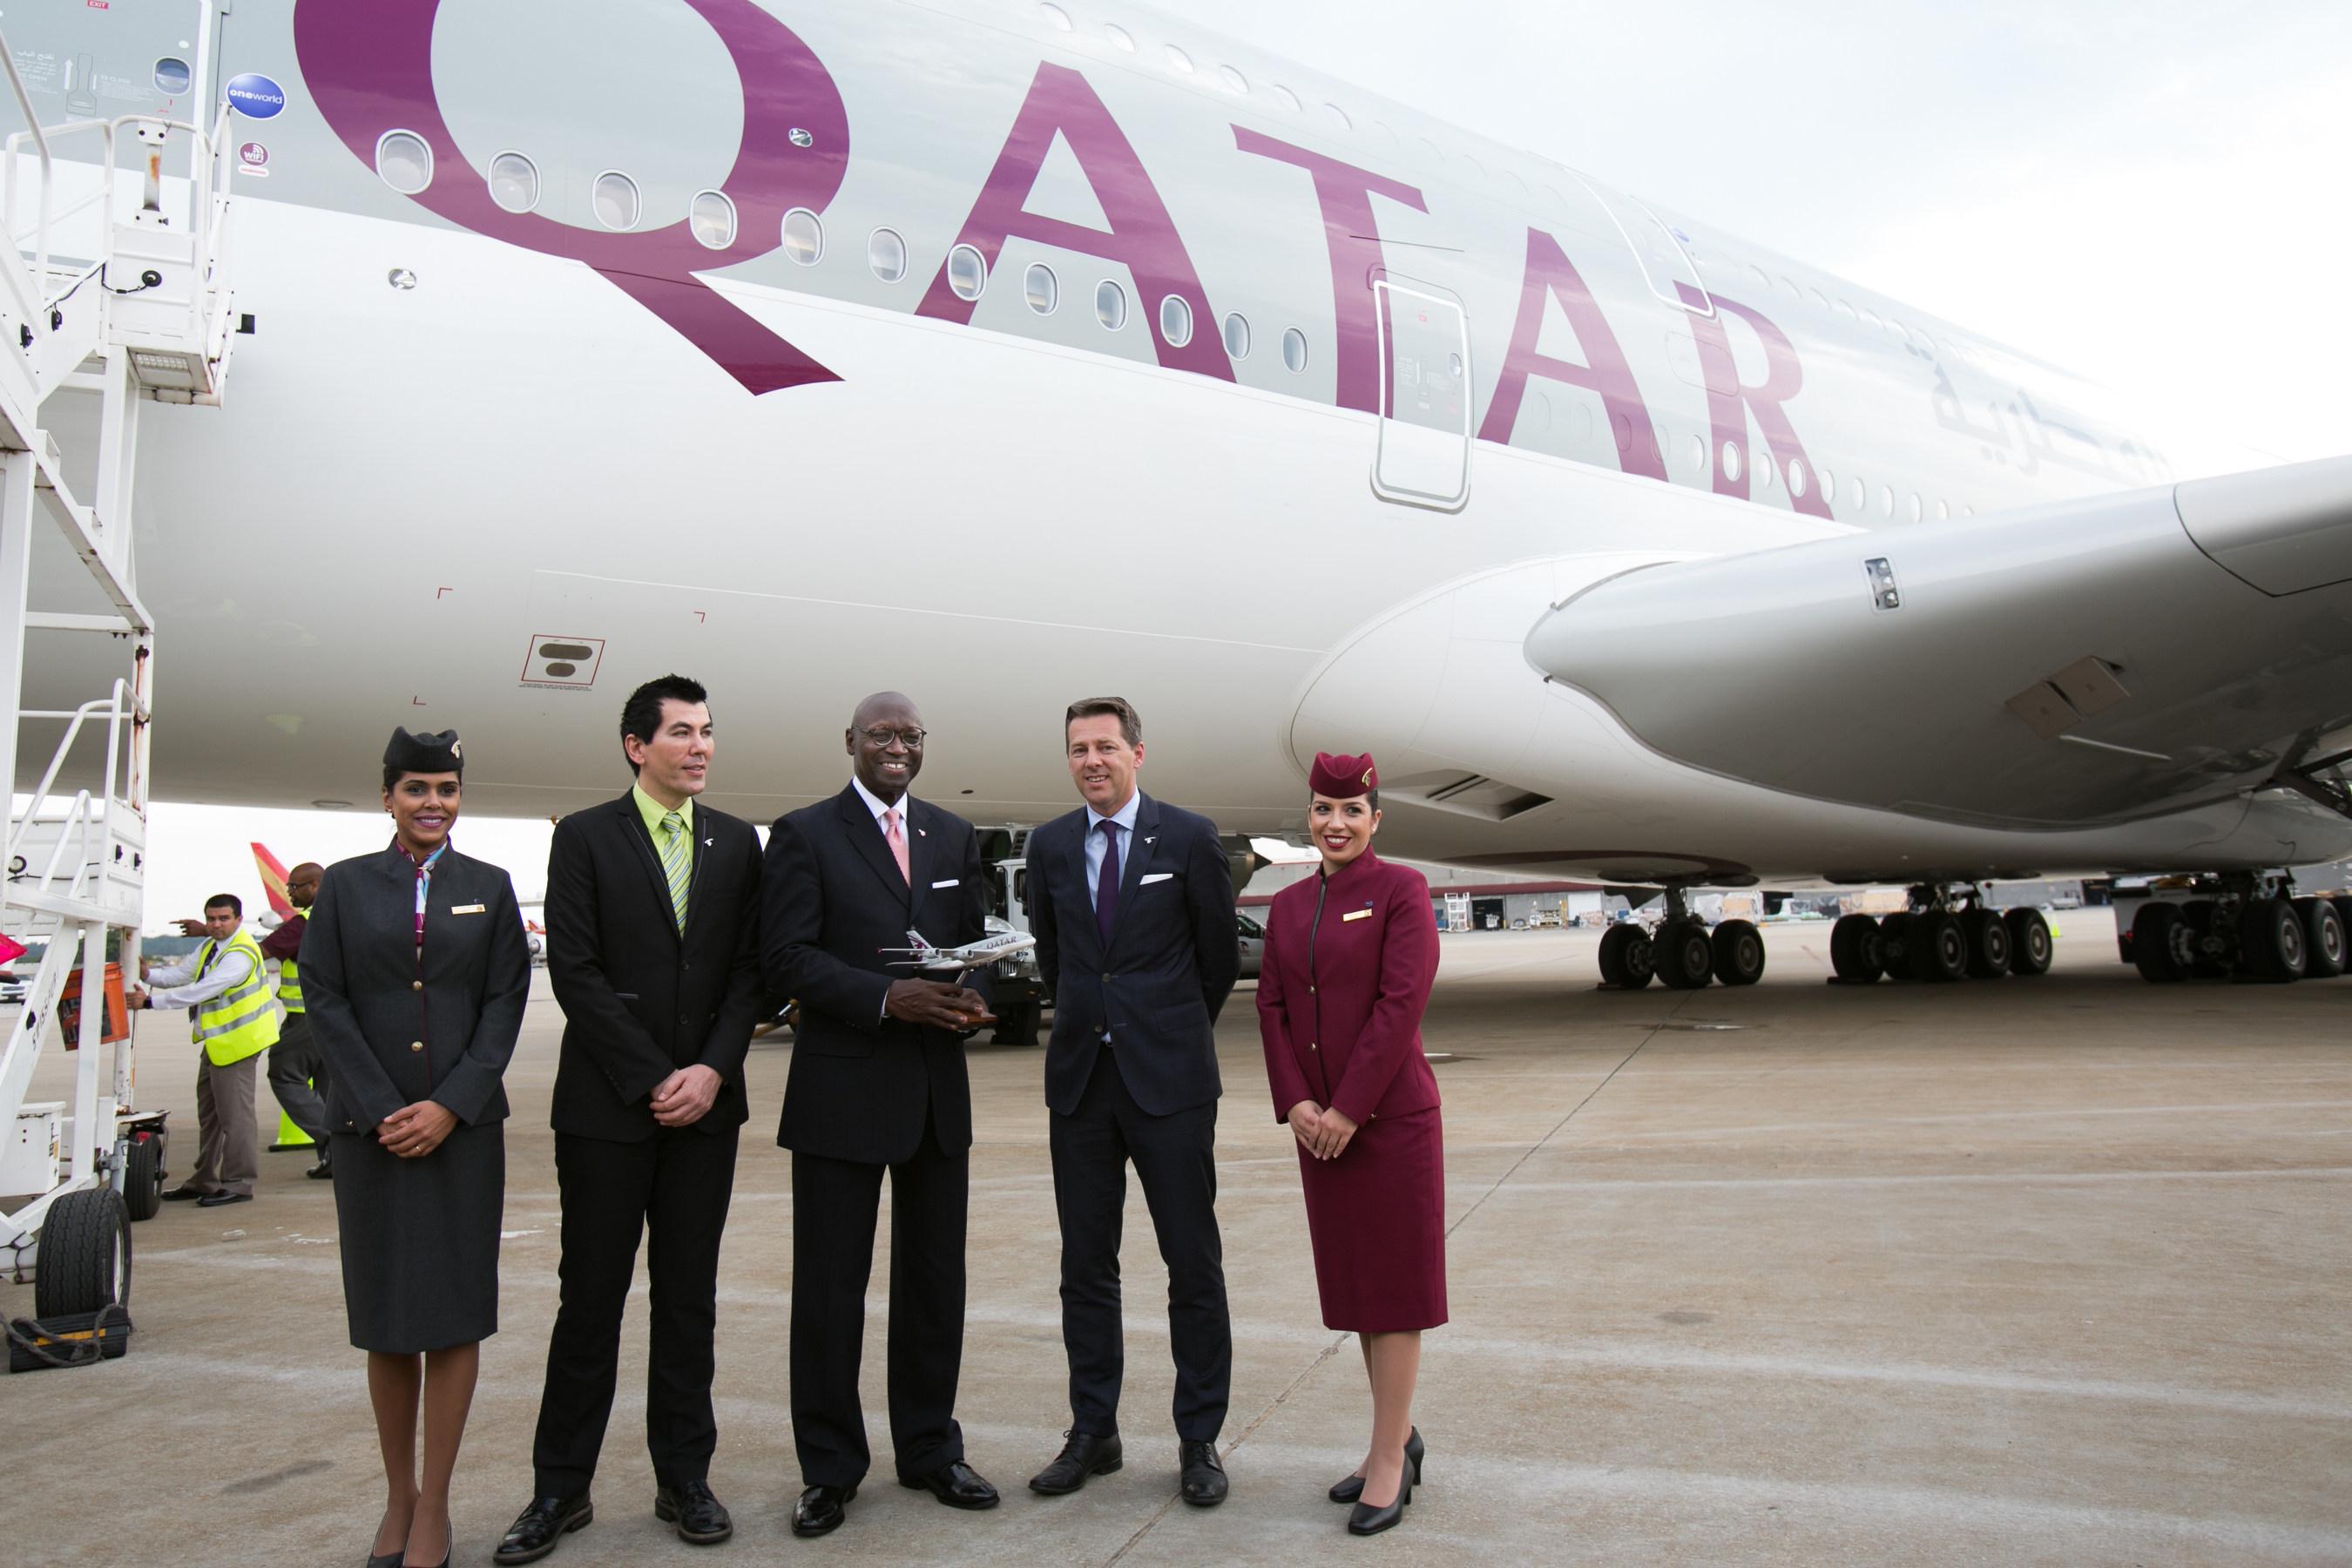 Qatar Airways Senior Vice President Customer Experience Rossen Dimitrov (left), Interim Airport Director Roosevelt Council Jr. (center) and Qatar Airways Vice President of Americas Gunter Saurwein exchange gifts before welcoming media aboard Qatar Airways' A380